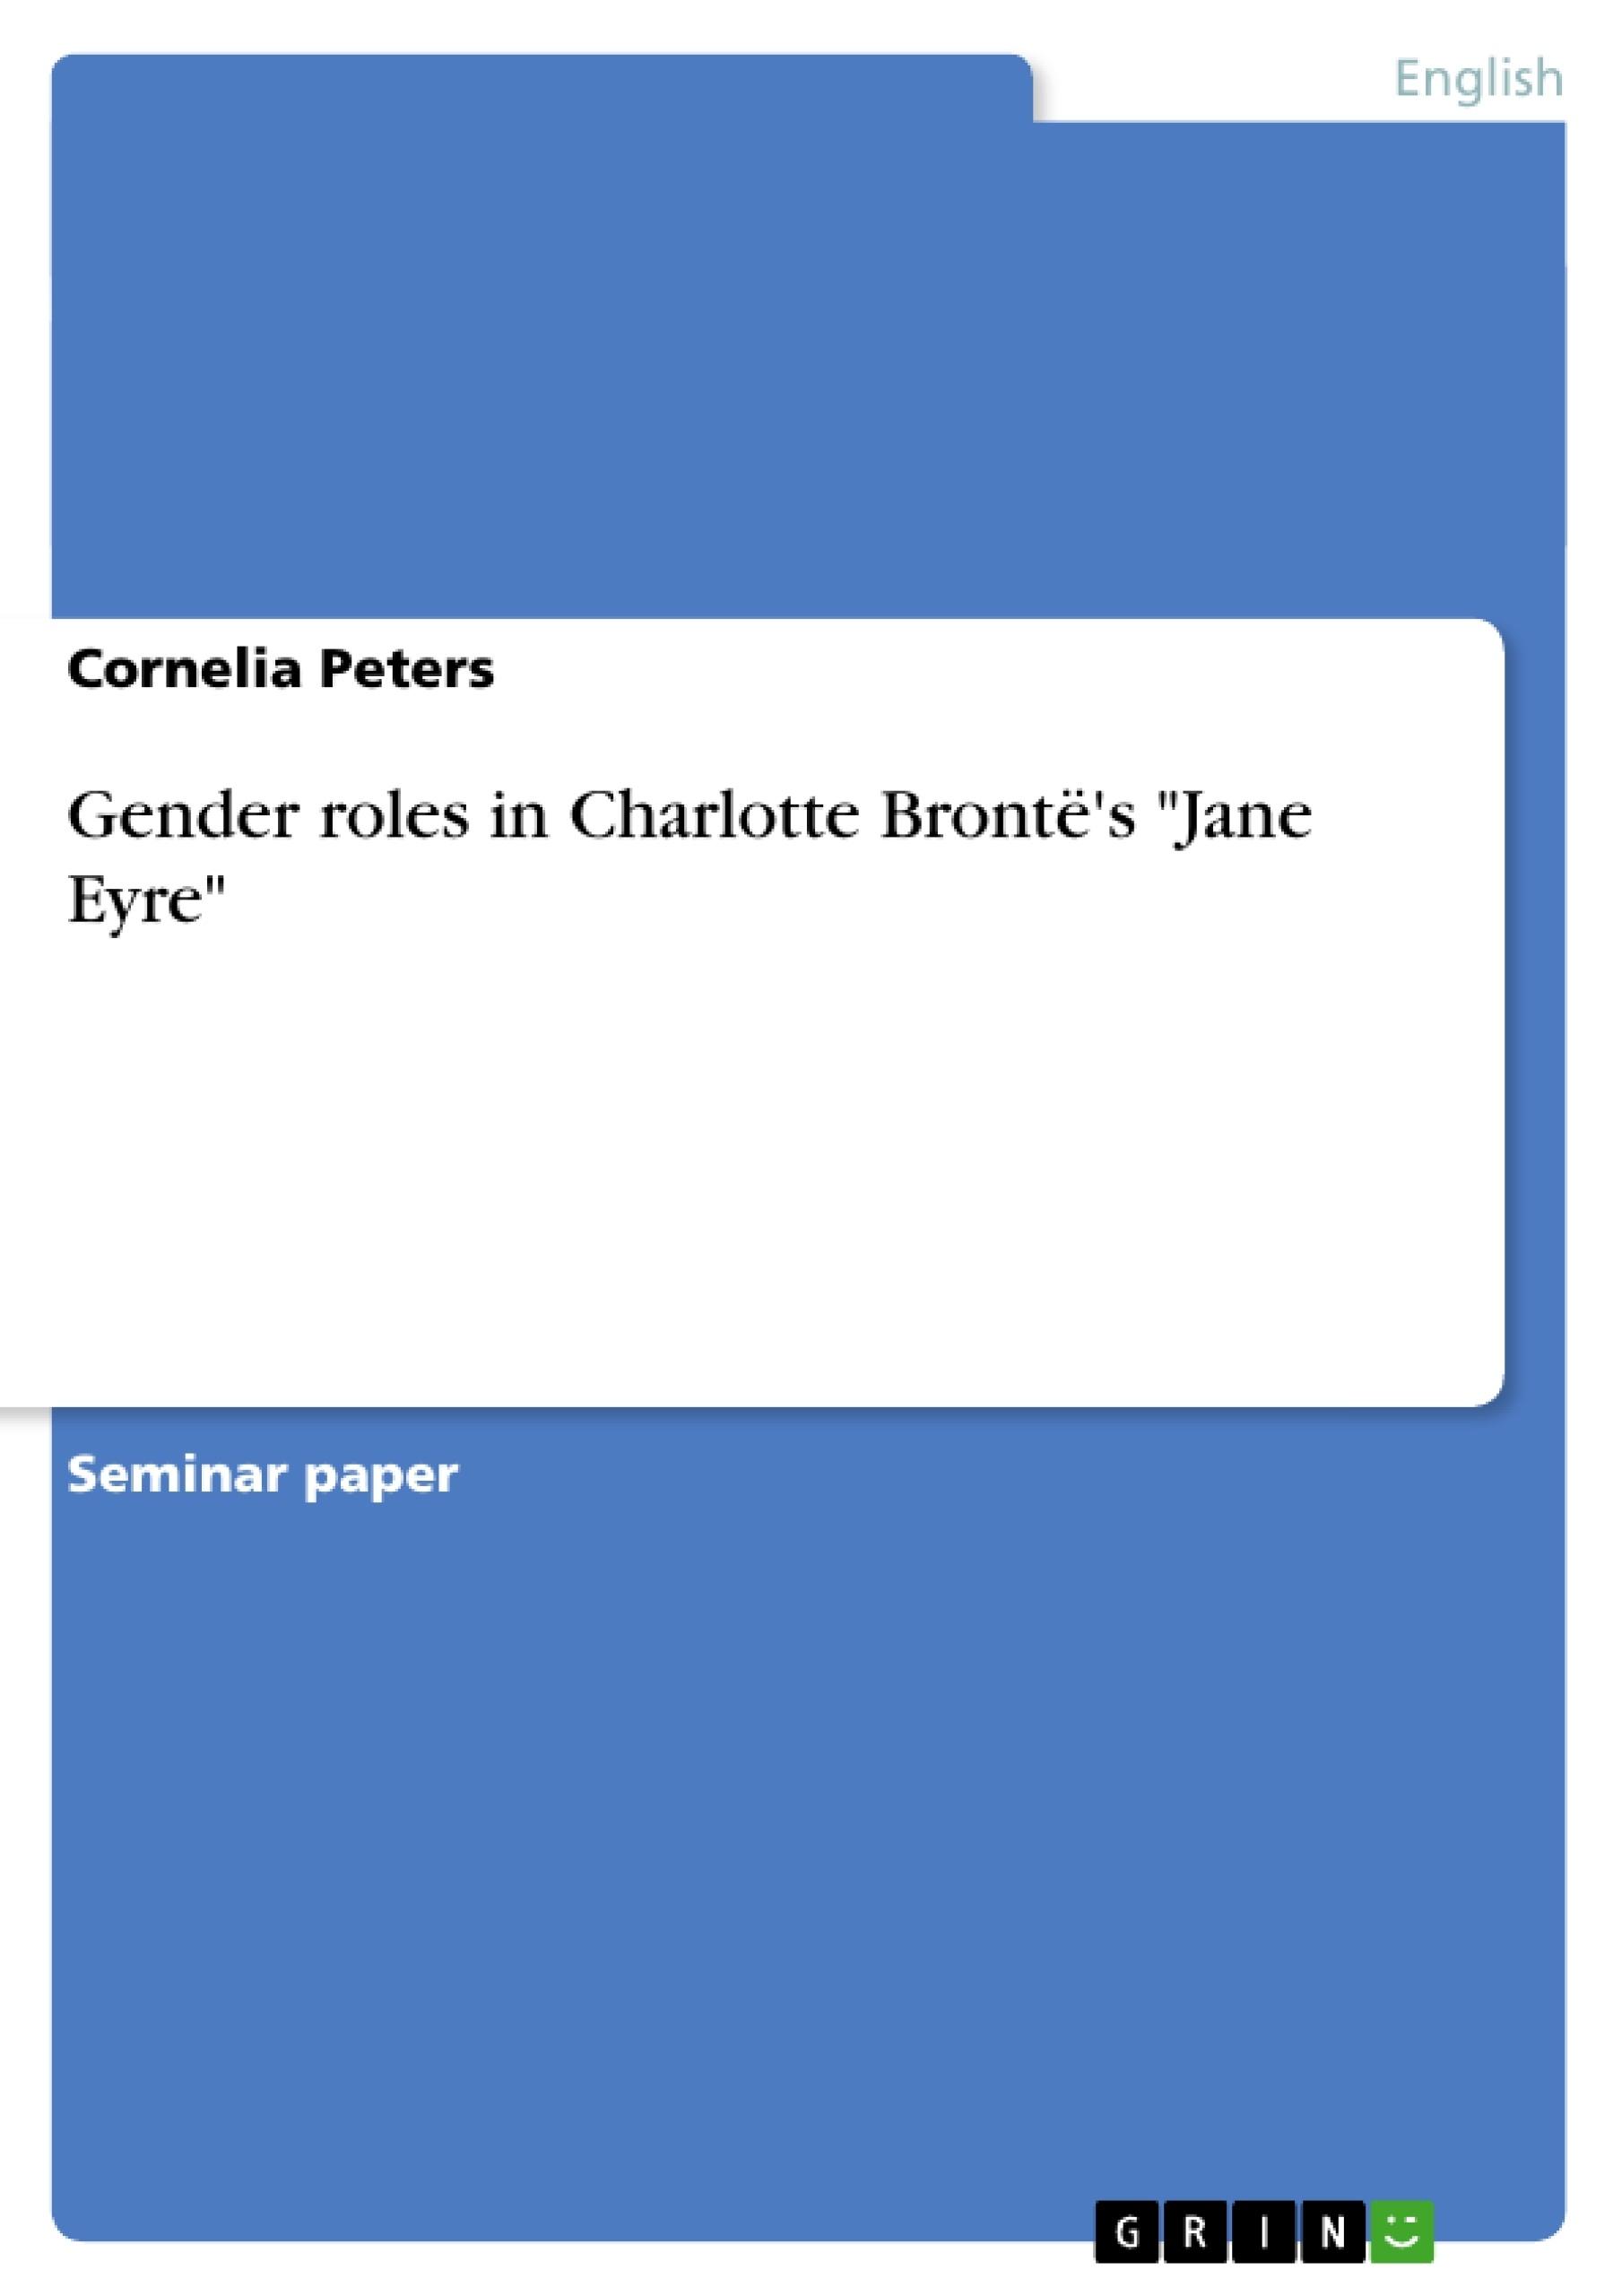 argumentative essay topics for jane eyre